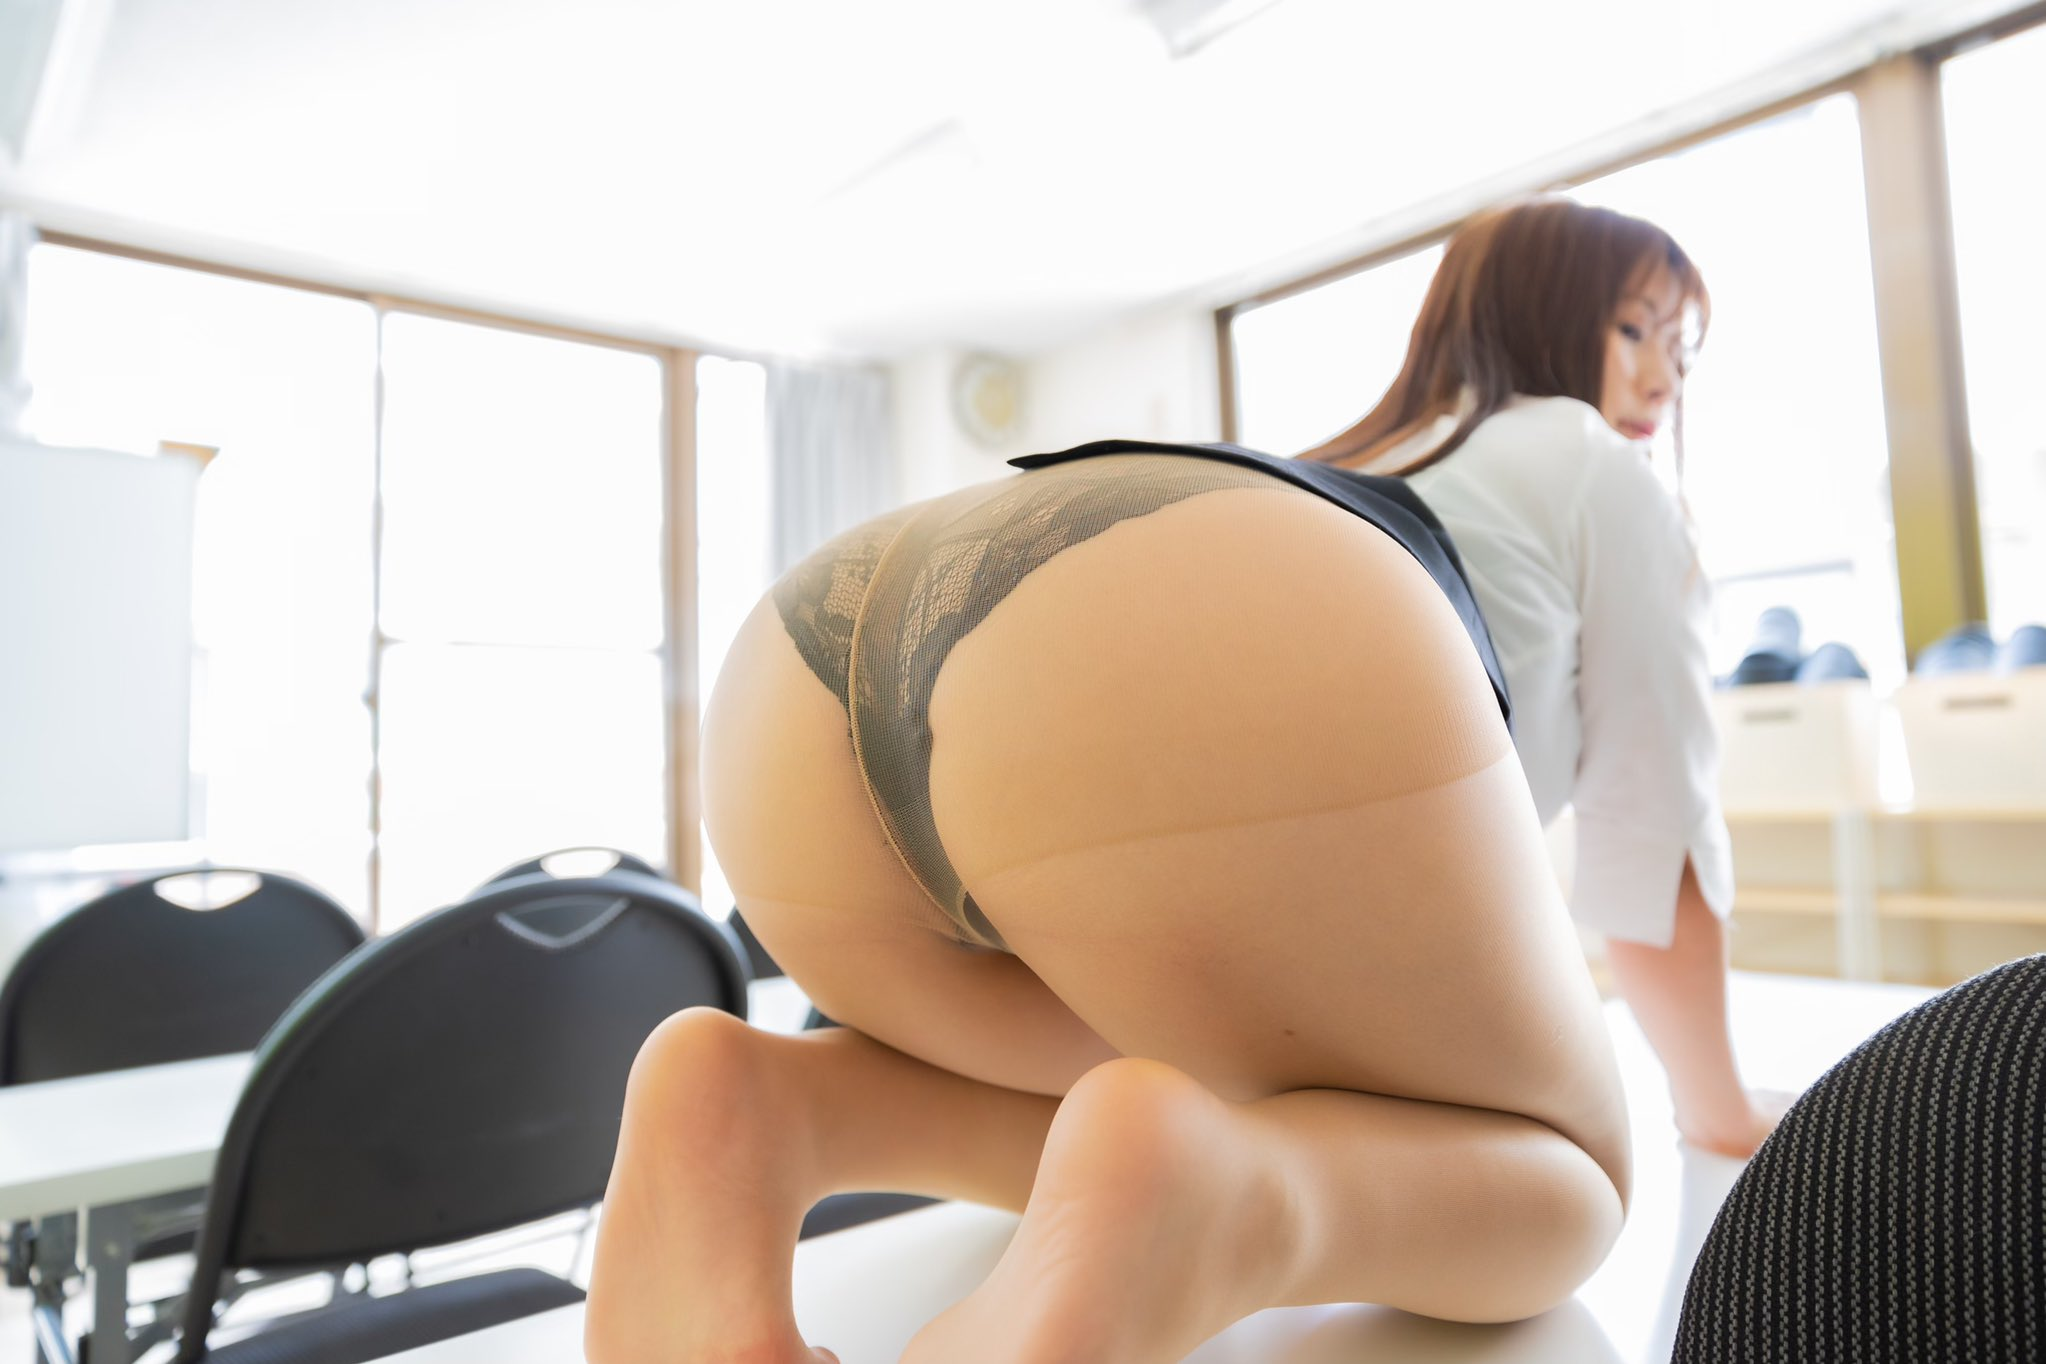 hoshino_ume091.jpg